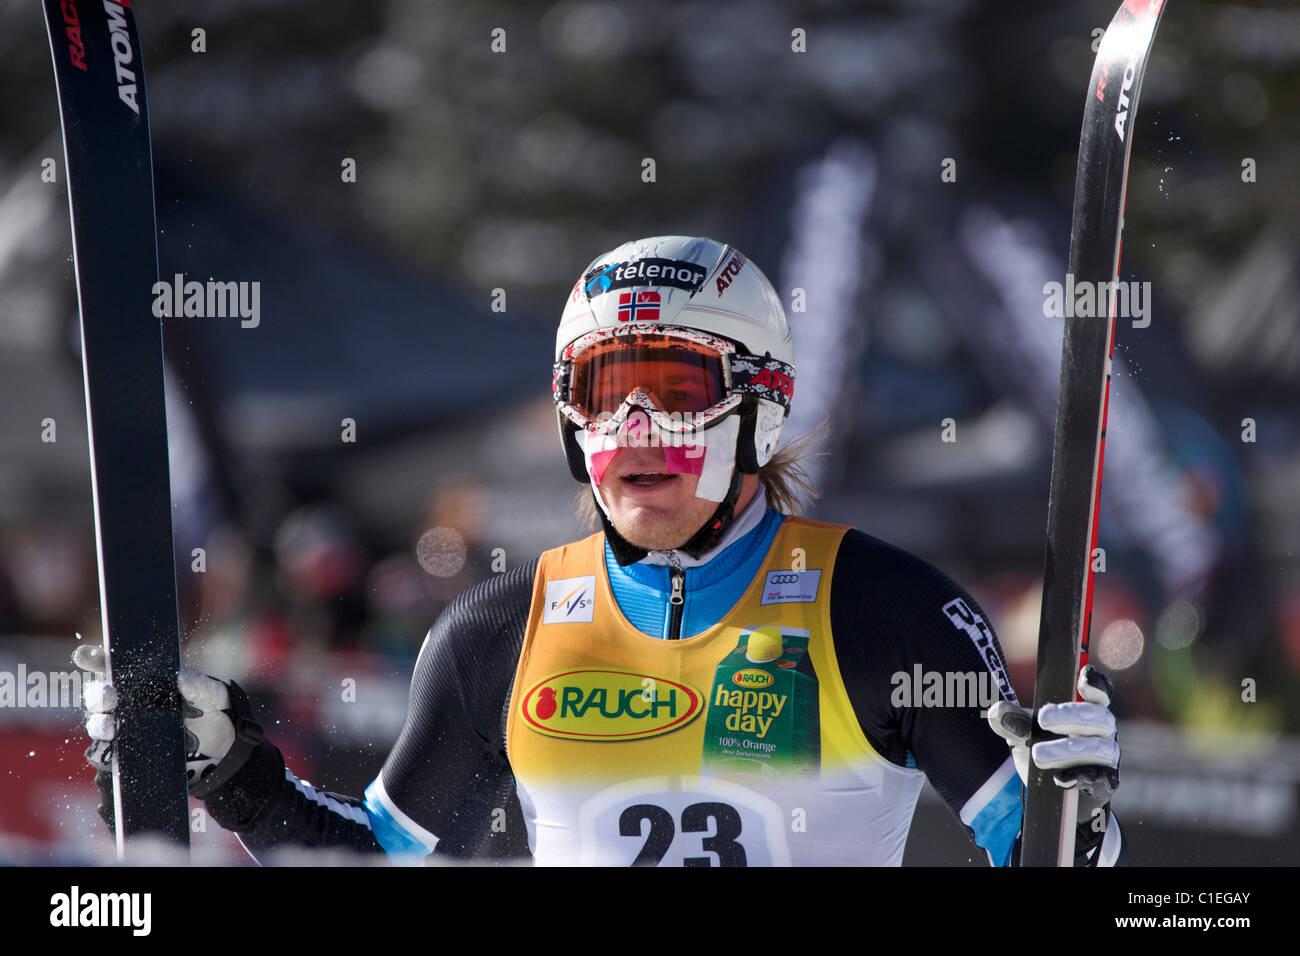 Kjetil Jansrud after finishing a downhill part of Super Combined in Beaver Creek - Stock Image